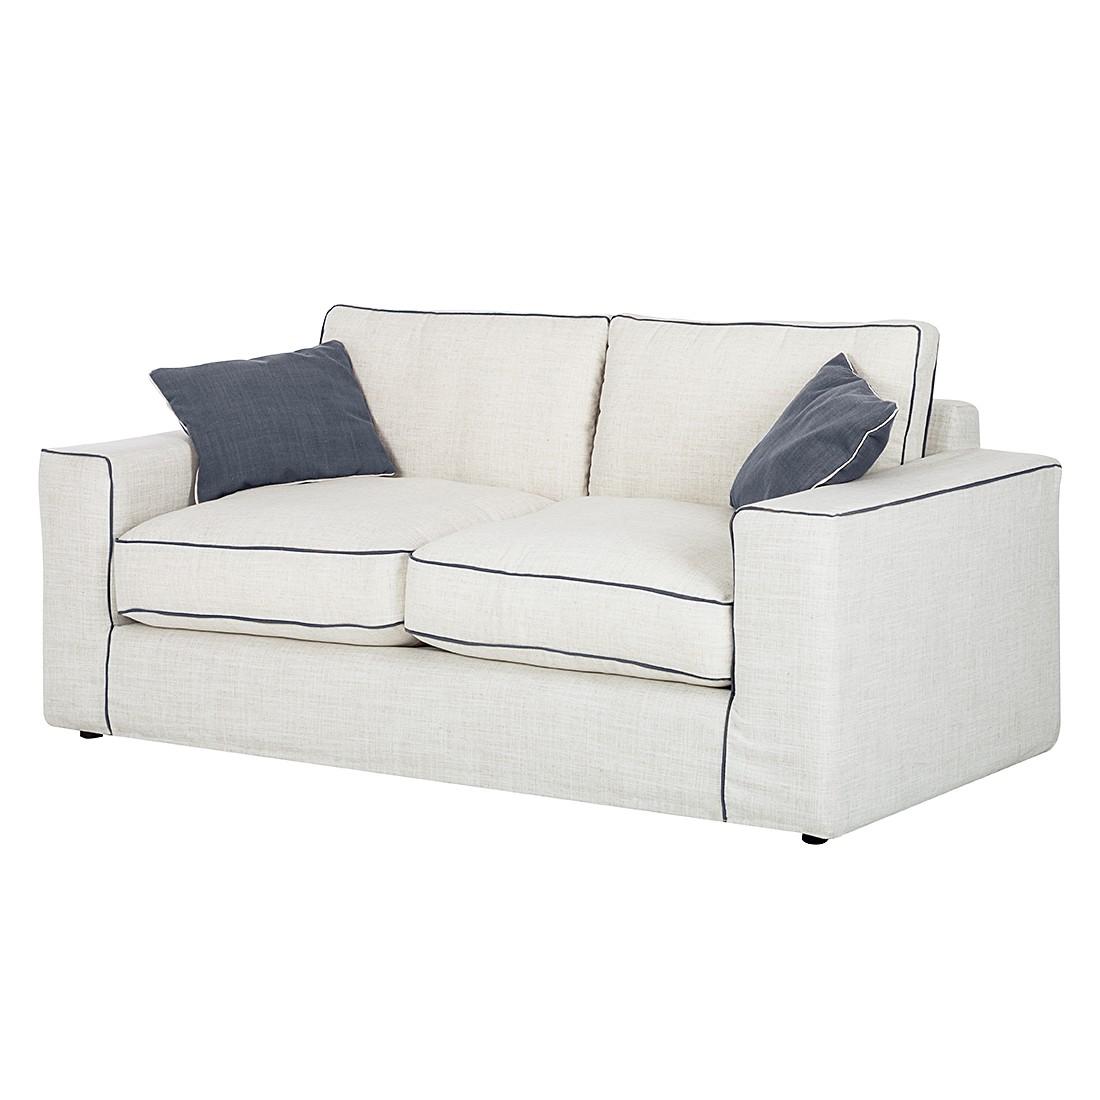 sofa pompidou 3 sitzer webstoff beige dunkelblau jack alice jetzt bestellen. Black Bedroom Furniture Sets. Home Design Ideas